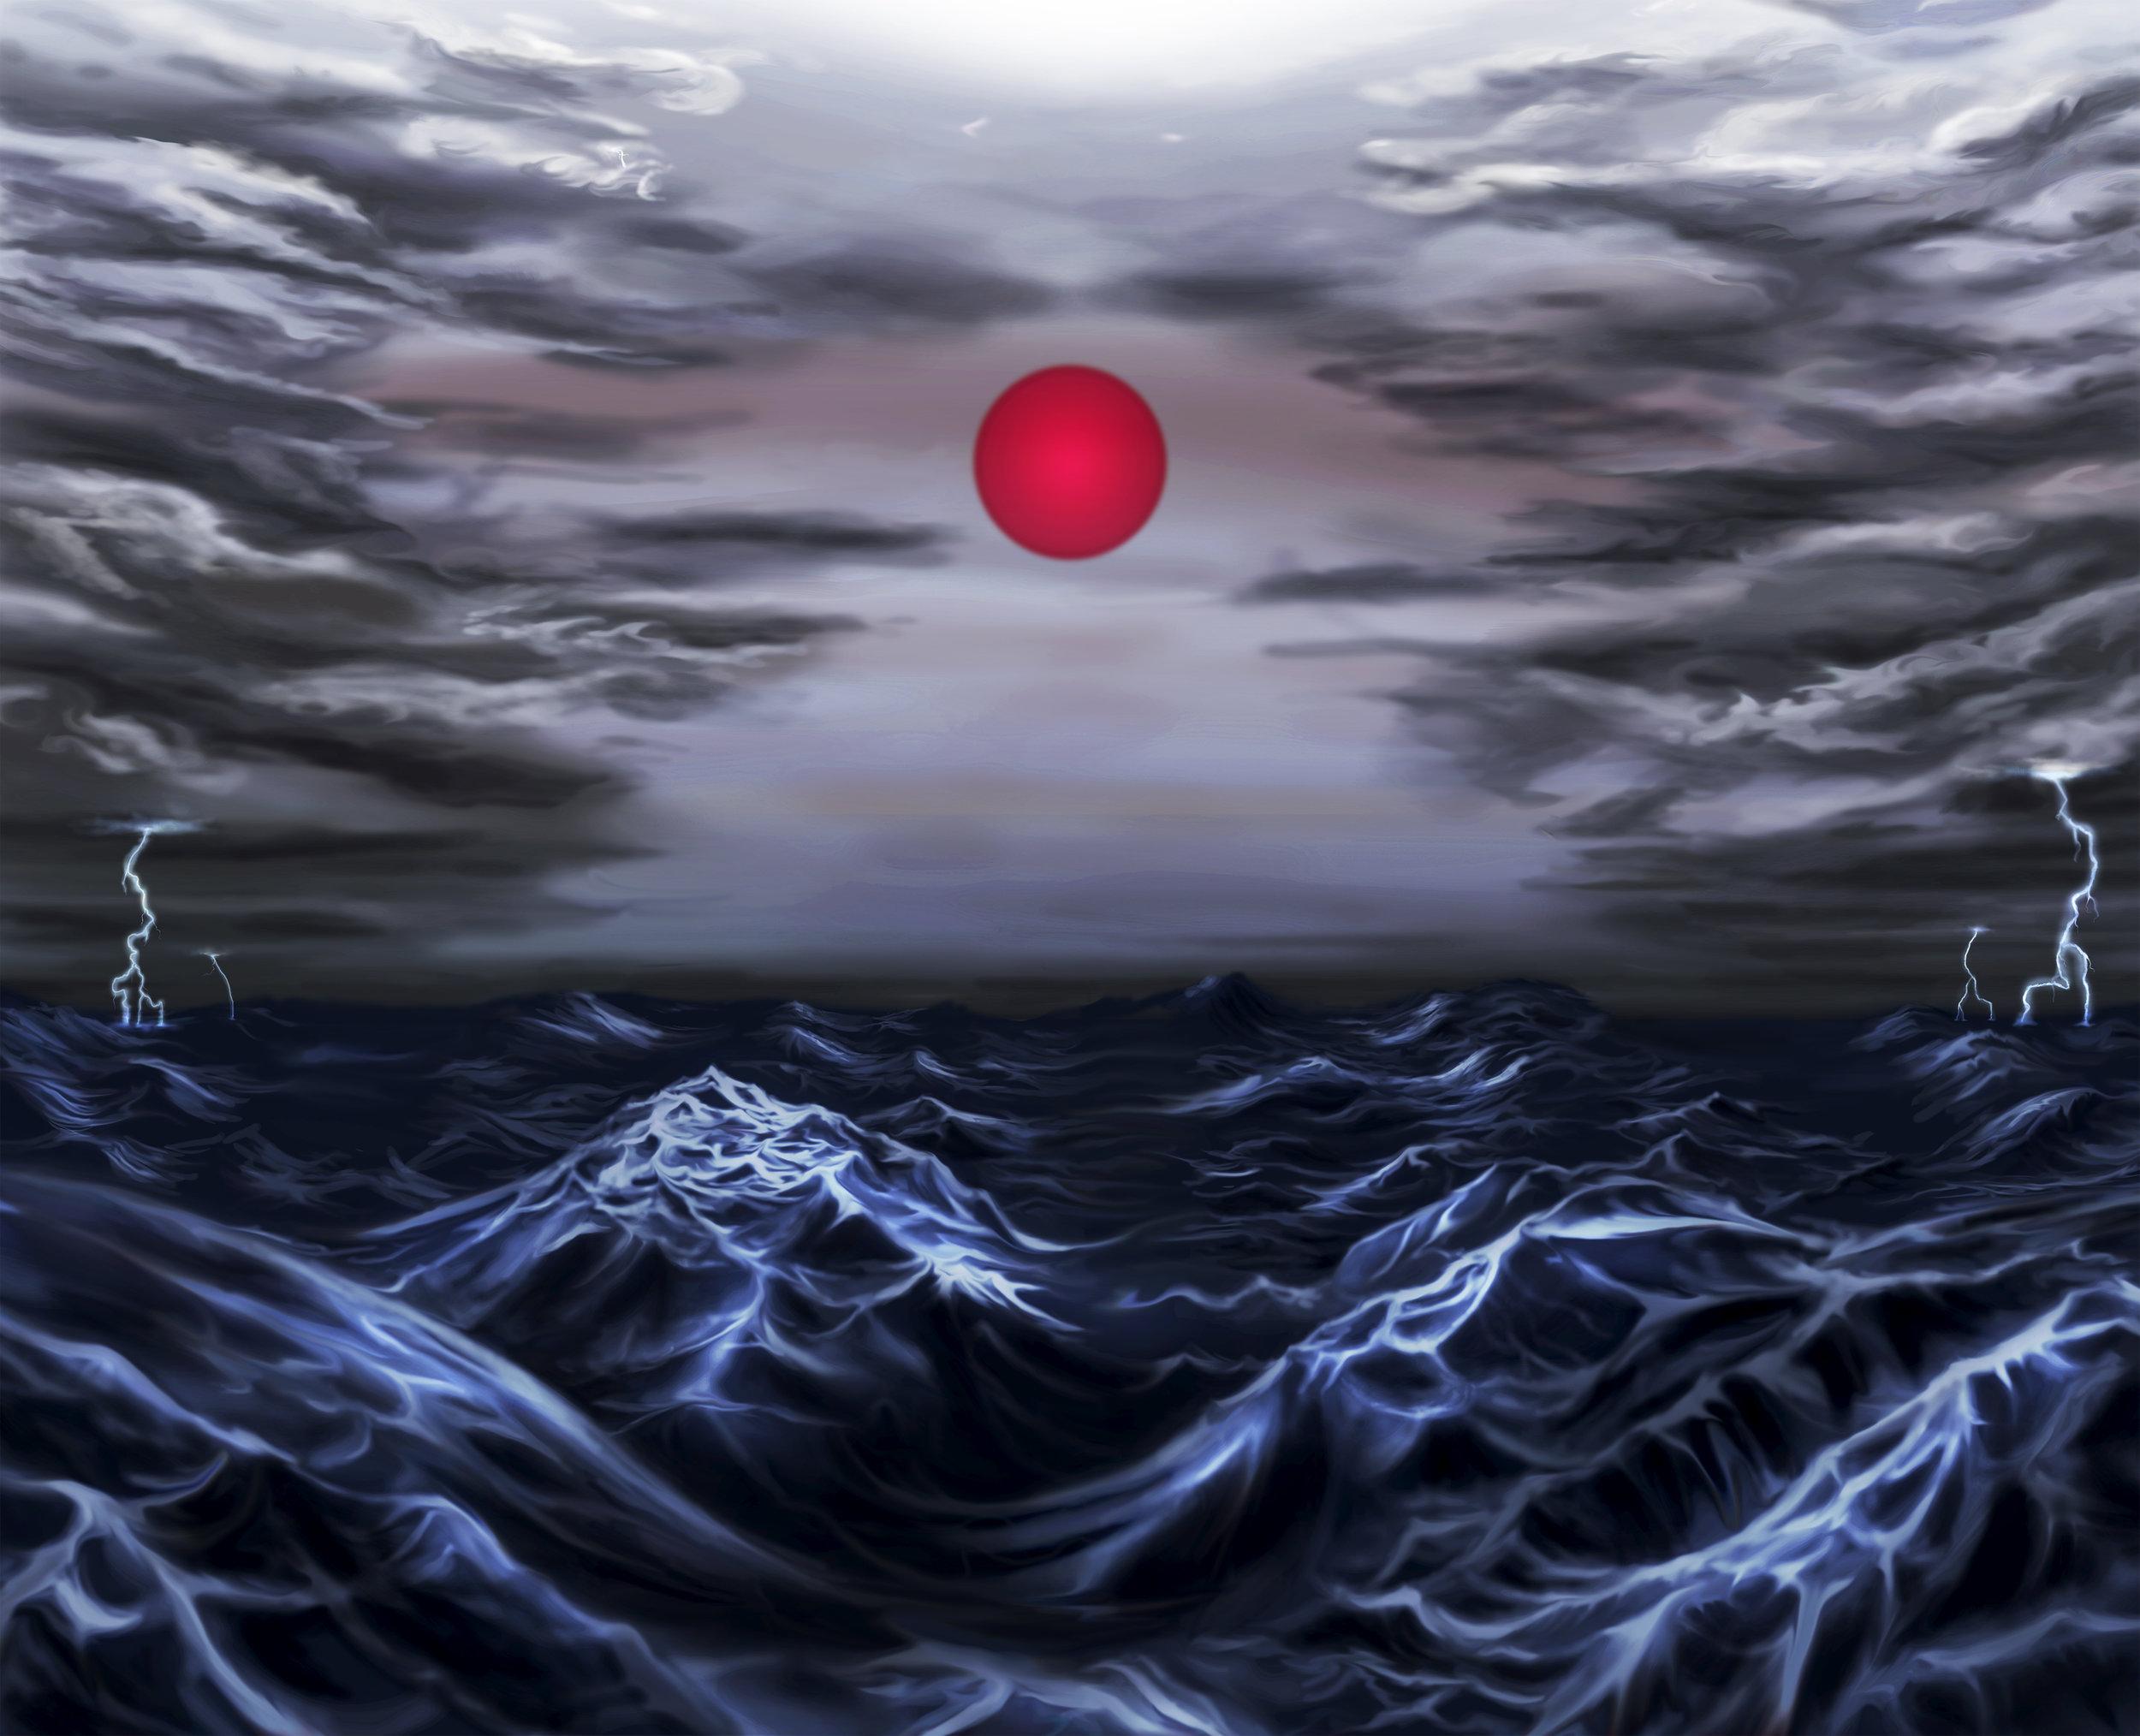 Red Sun Rising - Work in Progress, Photoshop.